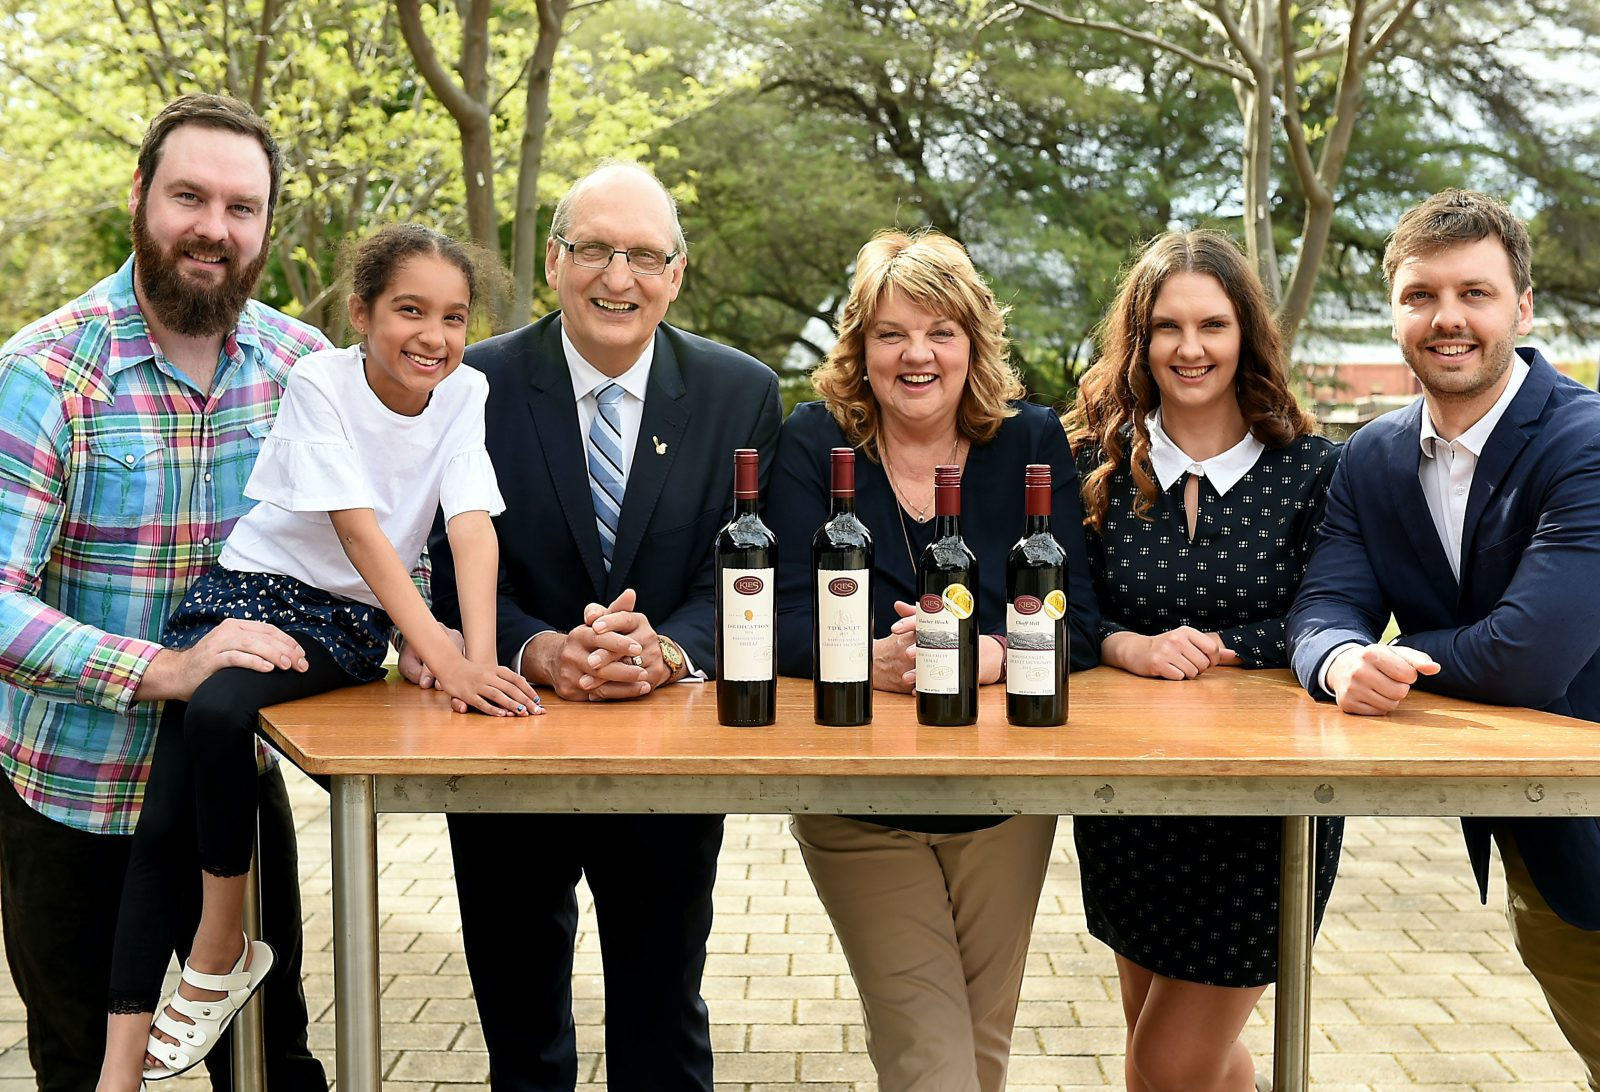 kies family with wine